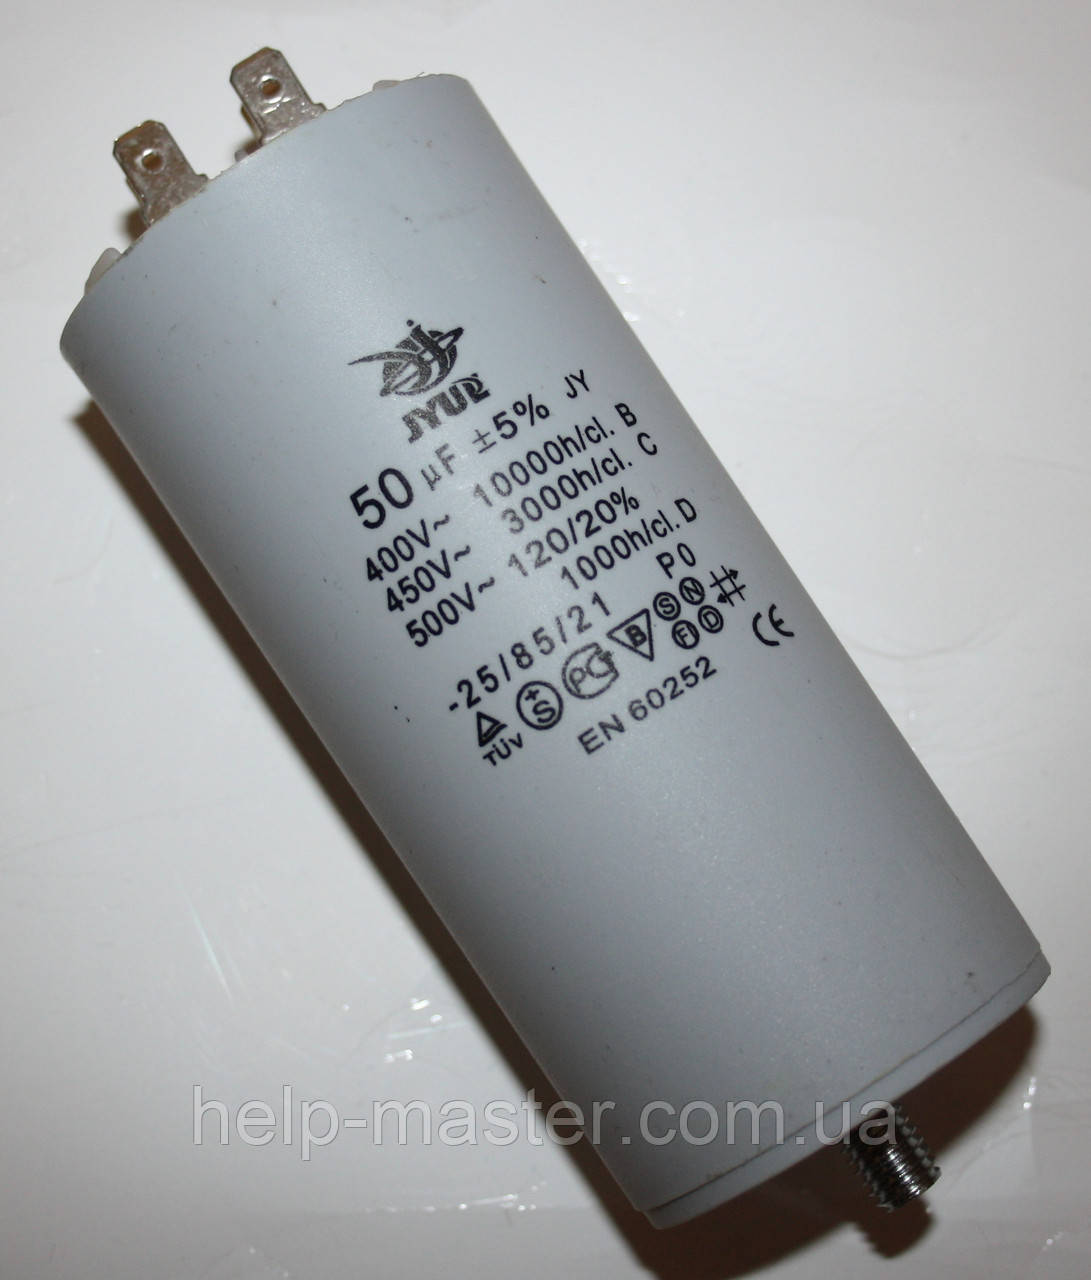 CBB-60M 50 mkf ~ 450 VAC (±5%) конденсатор для пуска и работы.Болт+клема JYUL (48*107 mm)